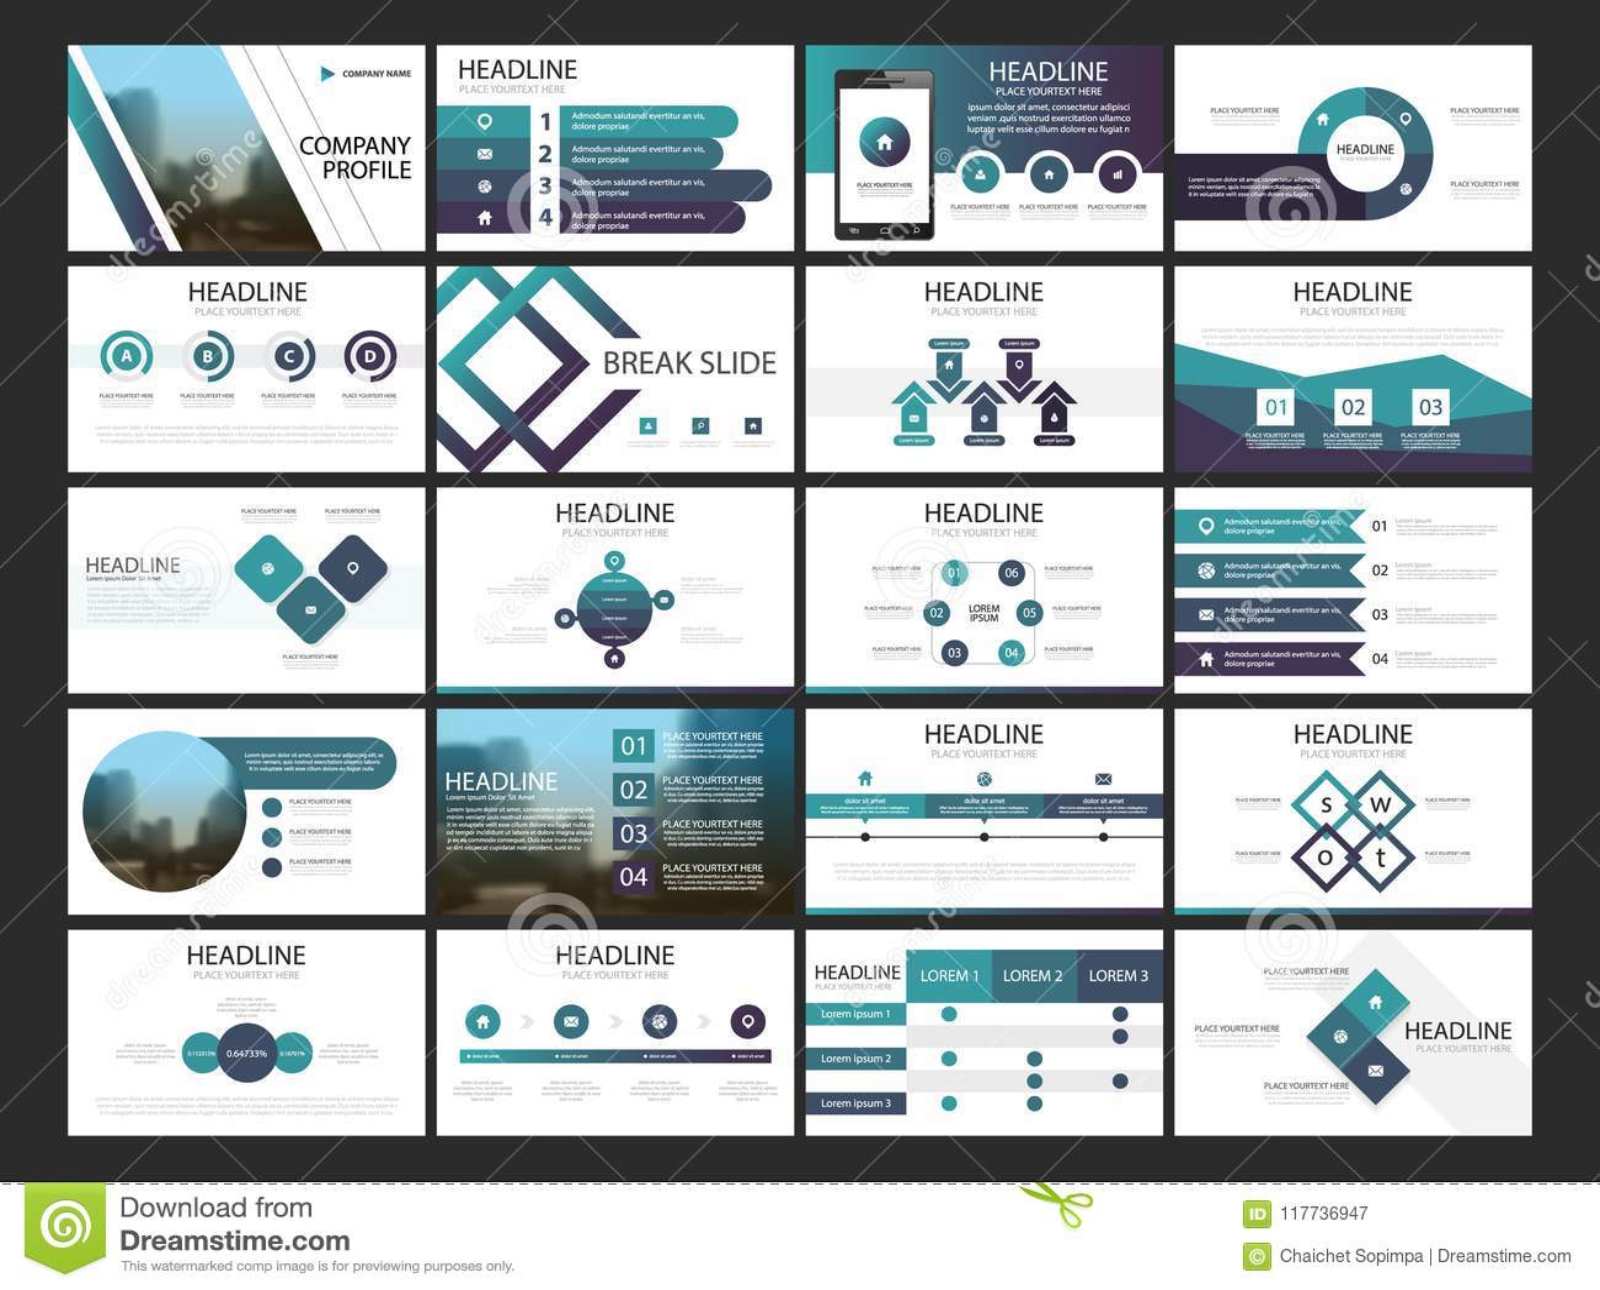 Bundle infographic elements presentation template. business annual report, brochure, leaflet, advertising flyer,